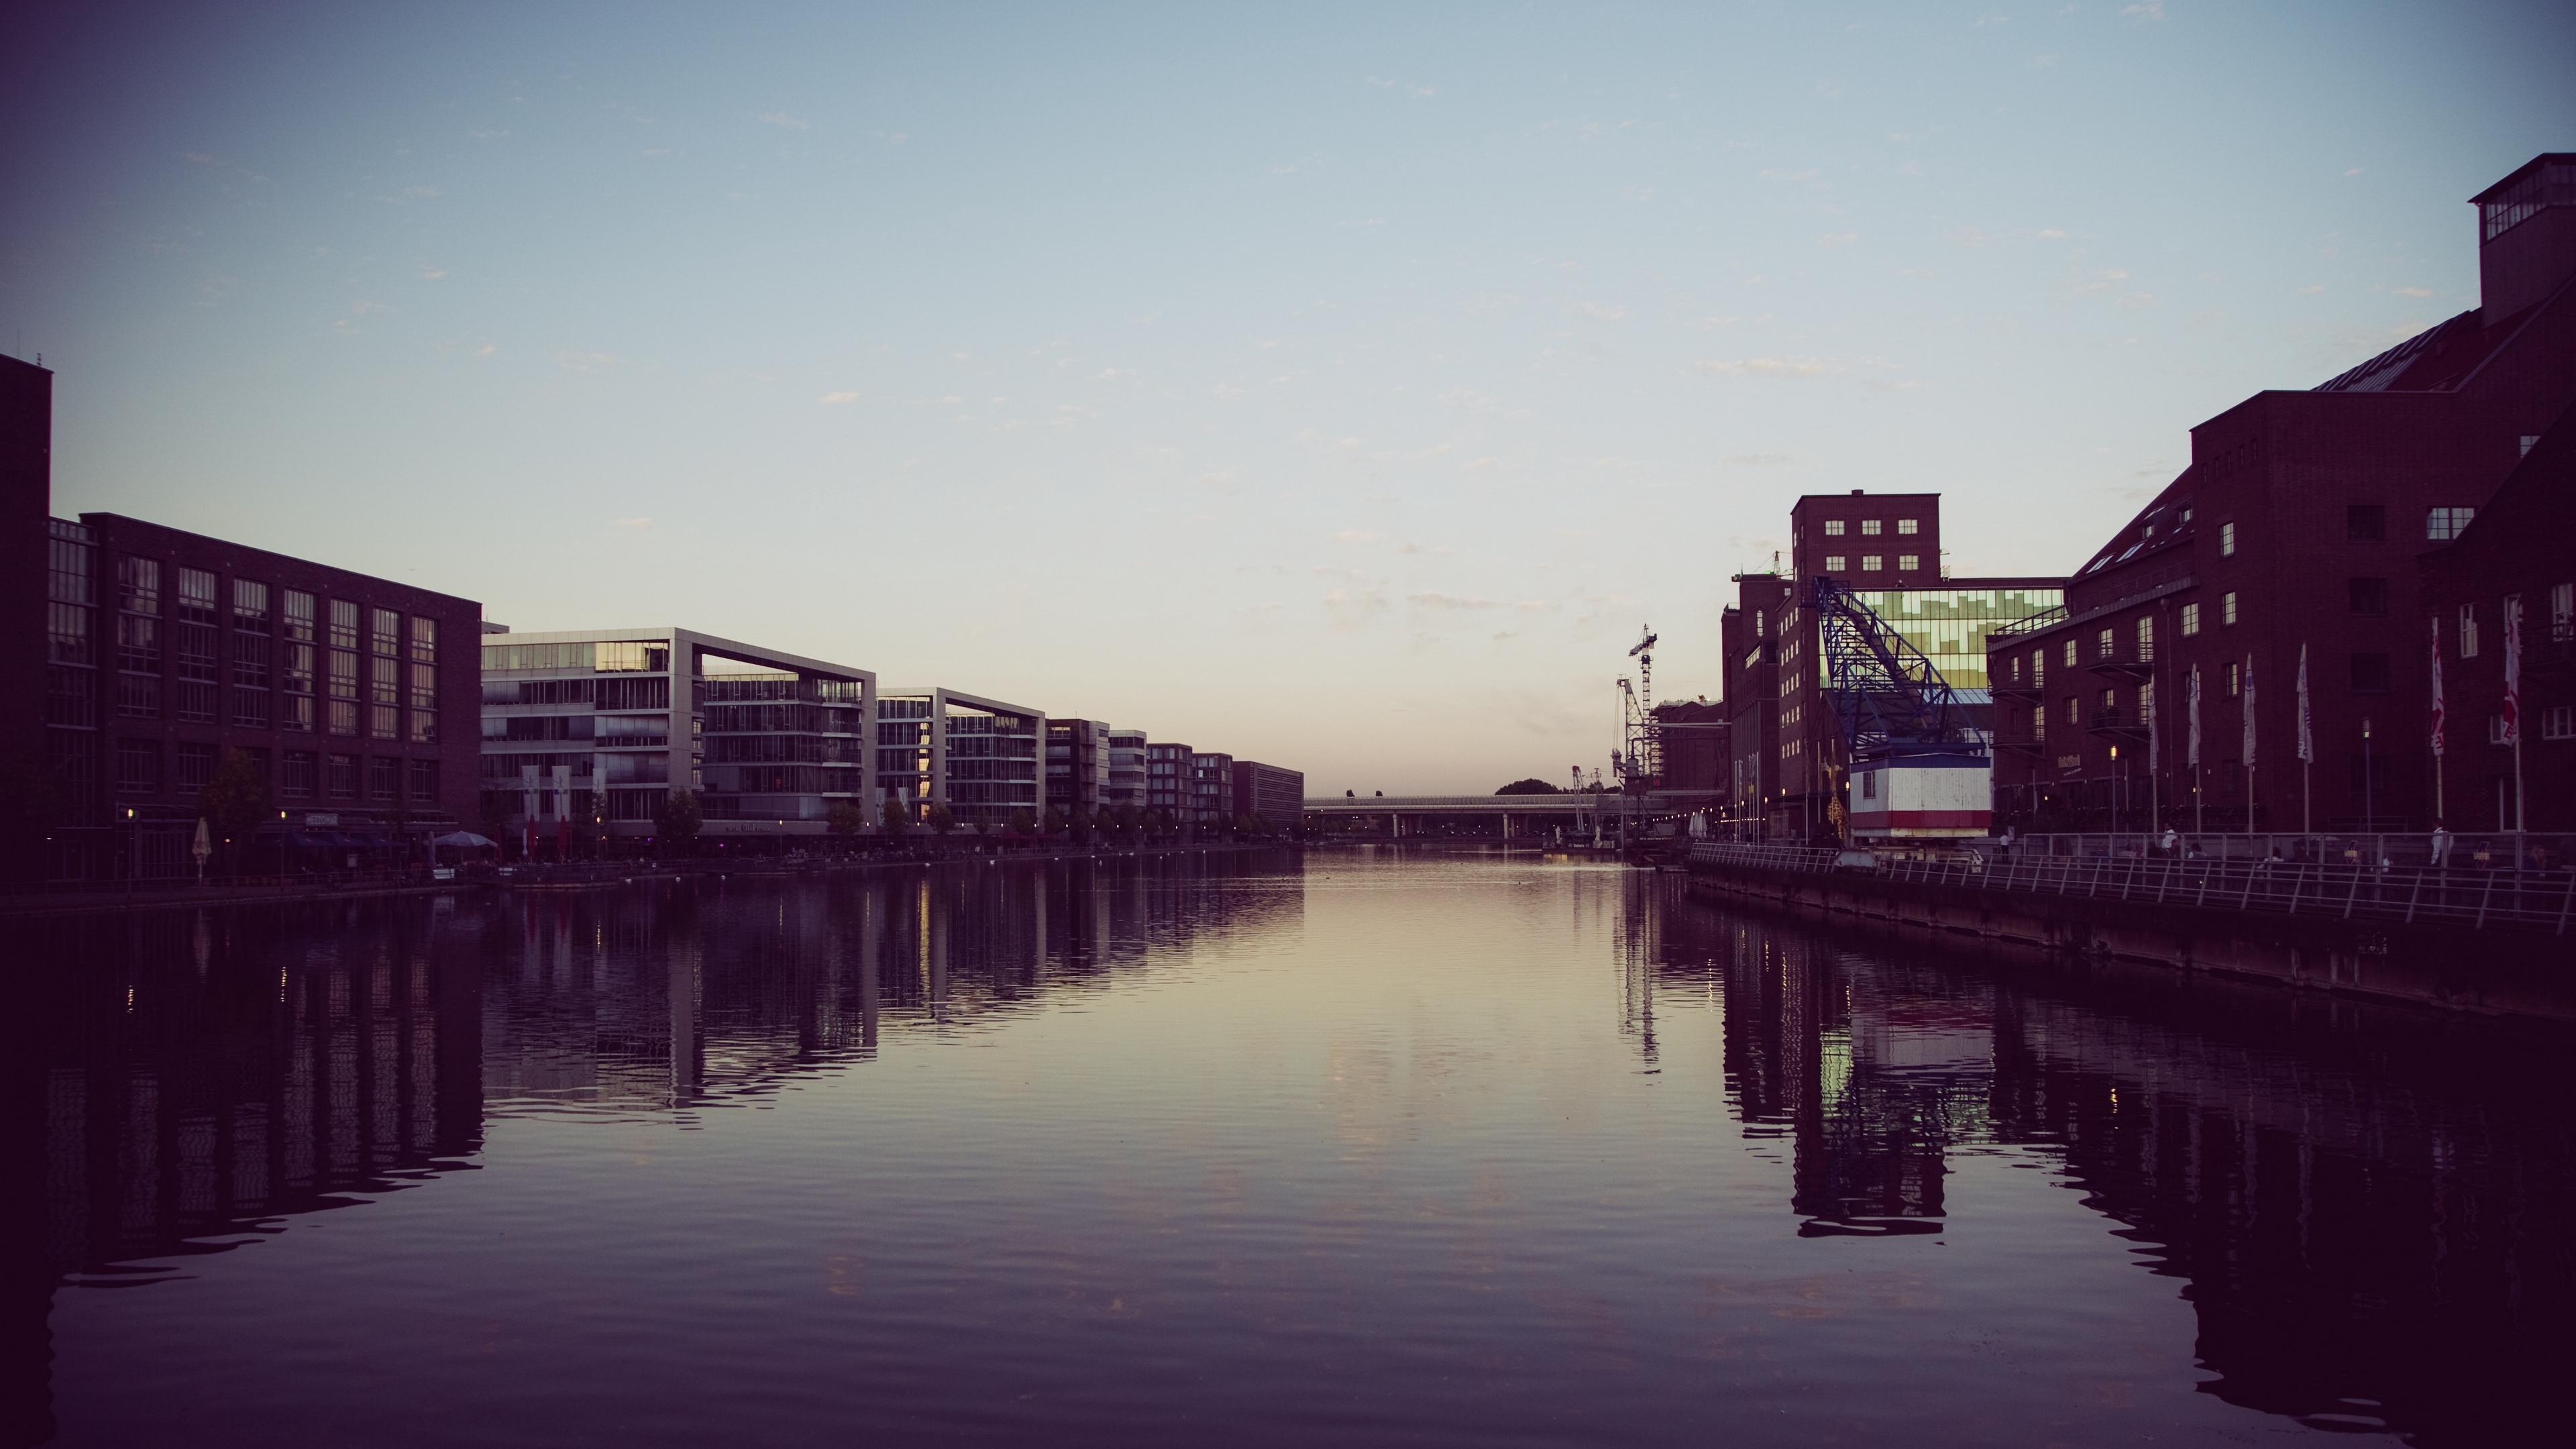 duisburg germany river building 4k 1538065250 - duisburg, germany, river, building 4k - River, Germany, duisburg